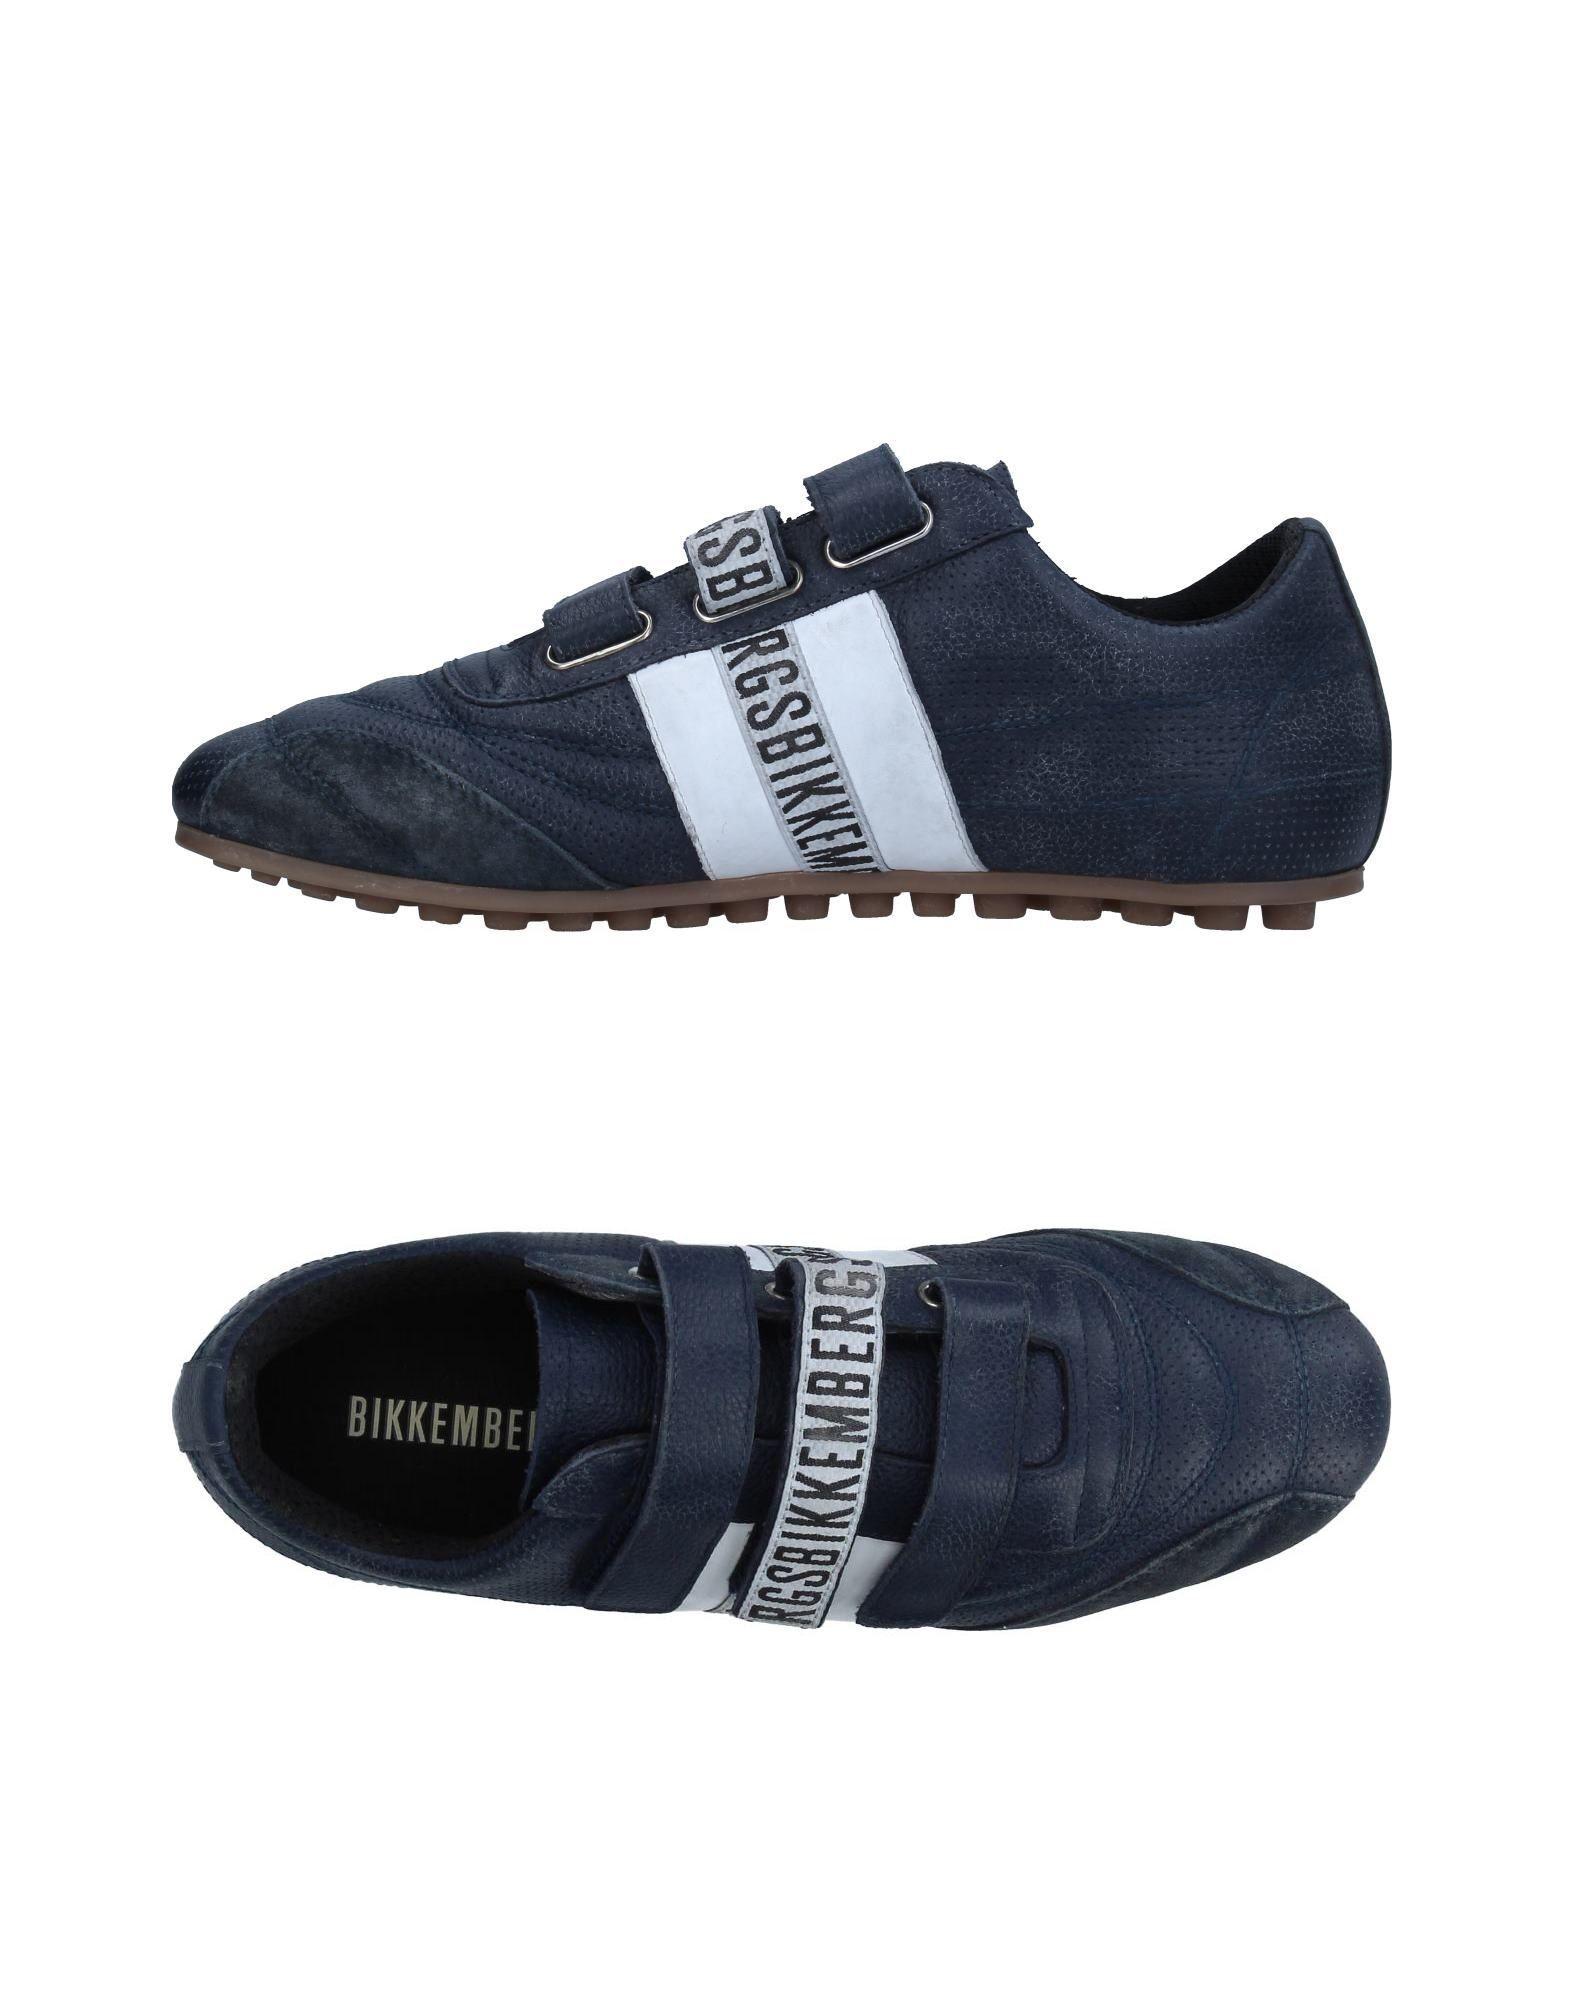 BIKKEMBERGS Herren Low Sneakers & Tennisschuhe Farbe Dunkelblau Größe 3 jetztbilligerkaufen